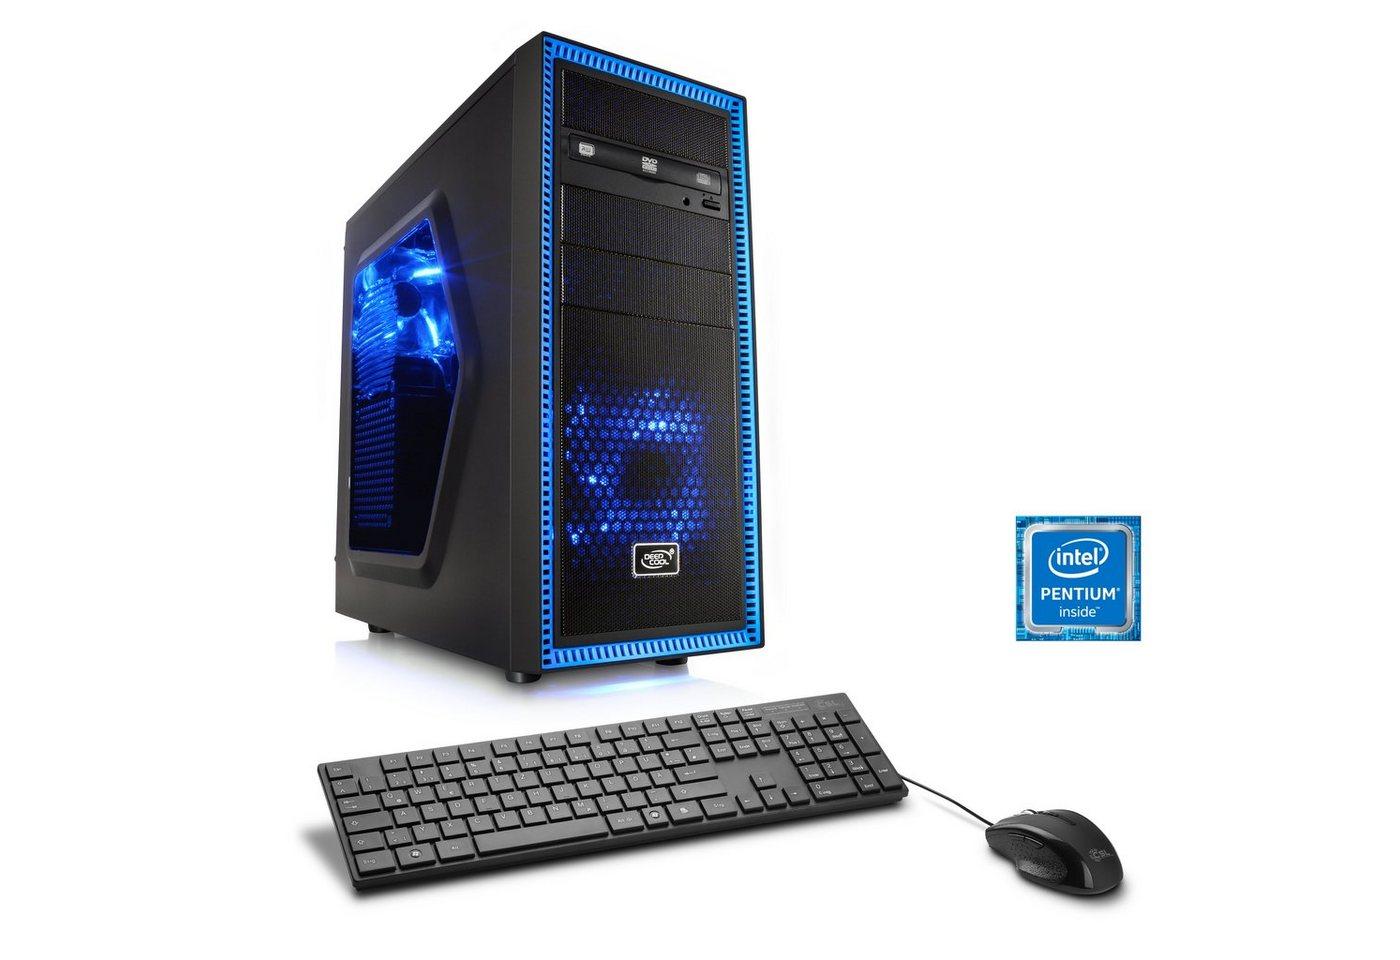 CSL Multimedia PC | Pentium G4560 | GeForce GT 1030 | 8 GB DDR4 RAM »Speed T1833 Windows 10 Home« - Preisvergleich